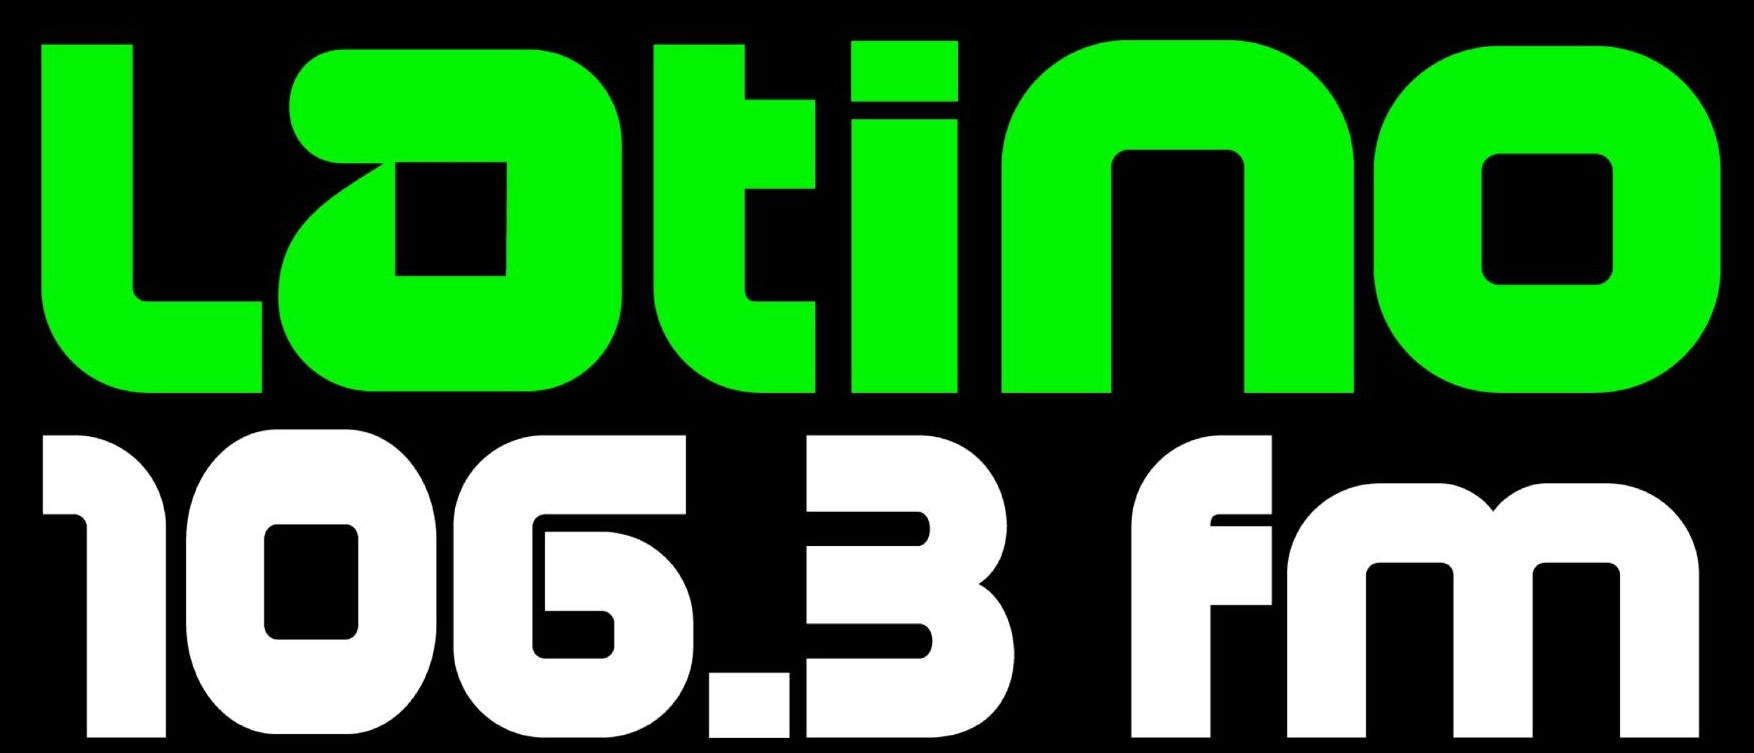 LATINO 106 DOT 3 FM Black_Fotor.jpg